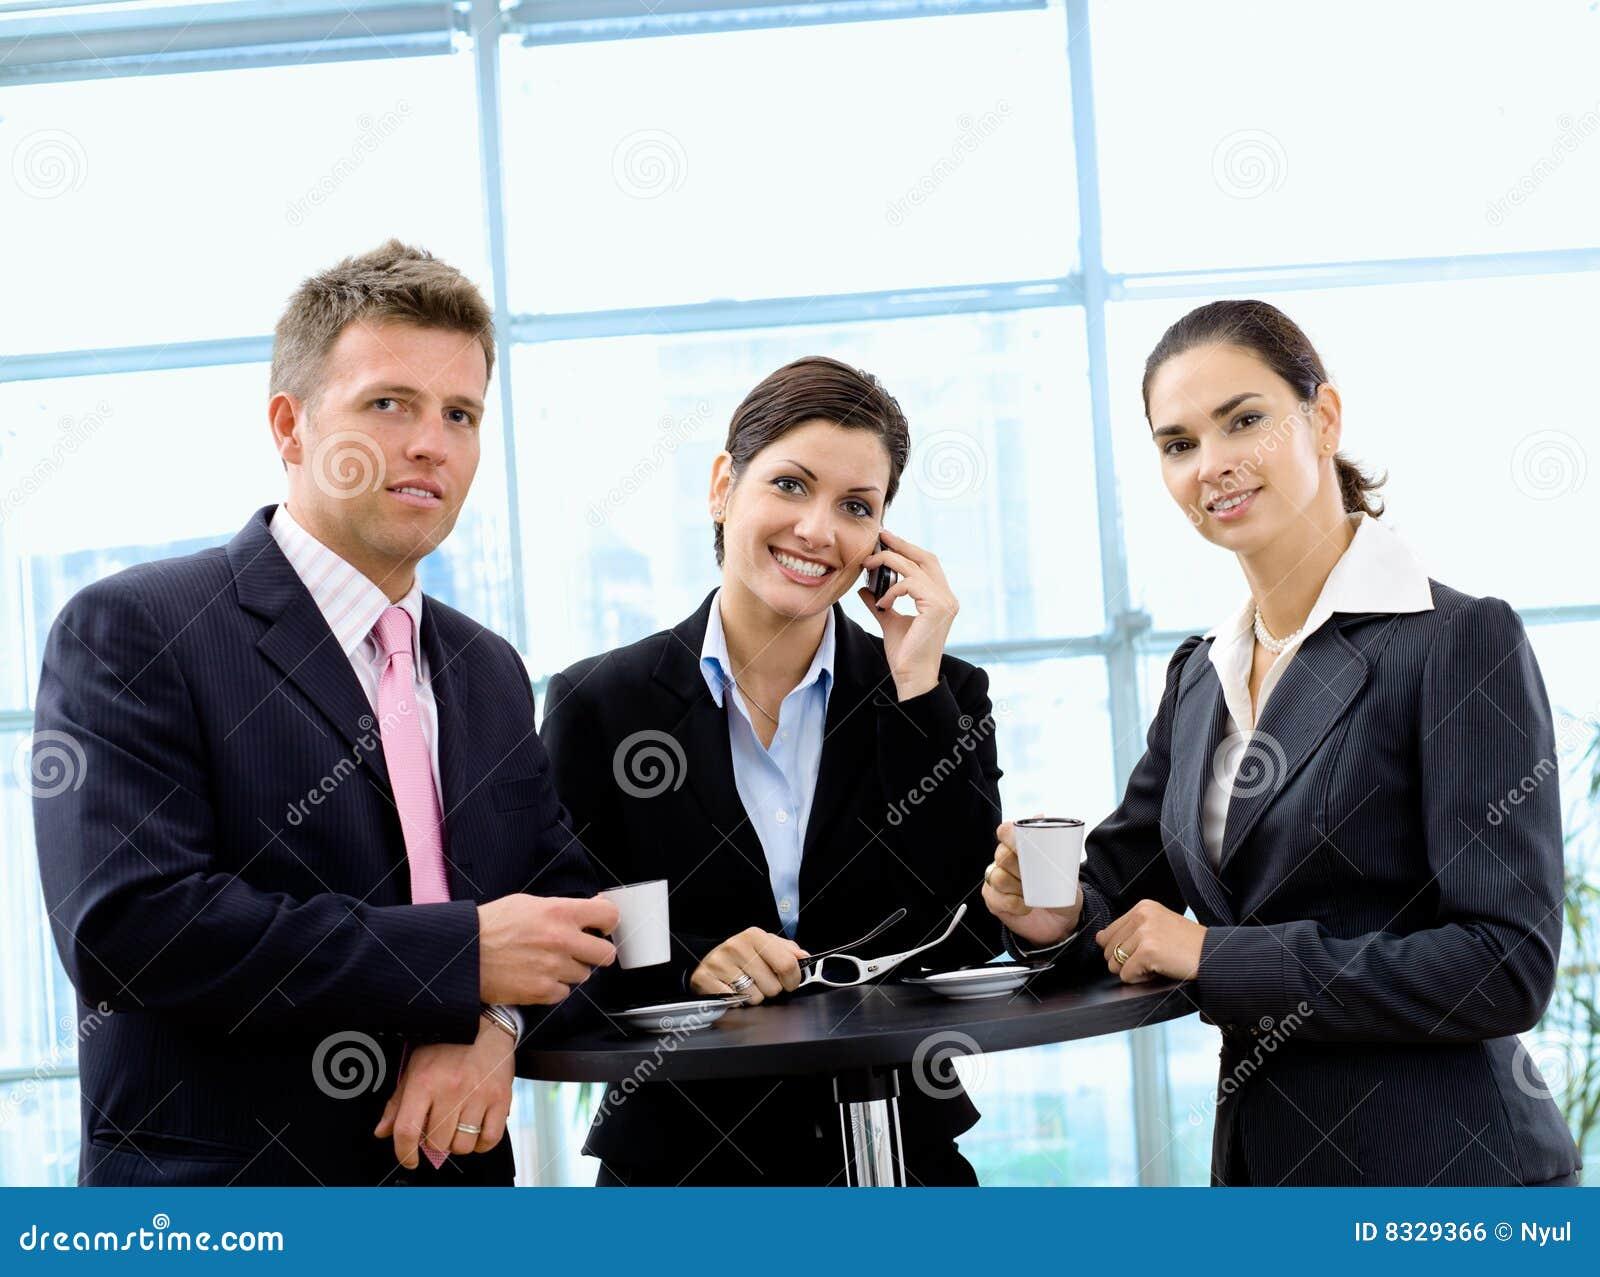 Businesspeople having coffee break